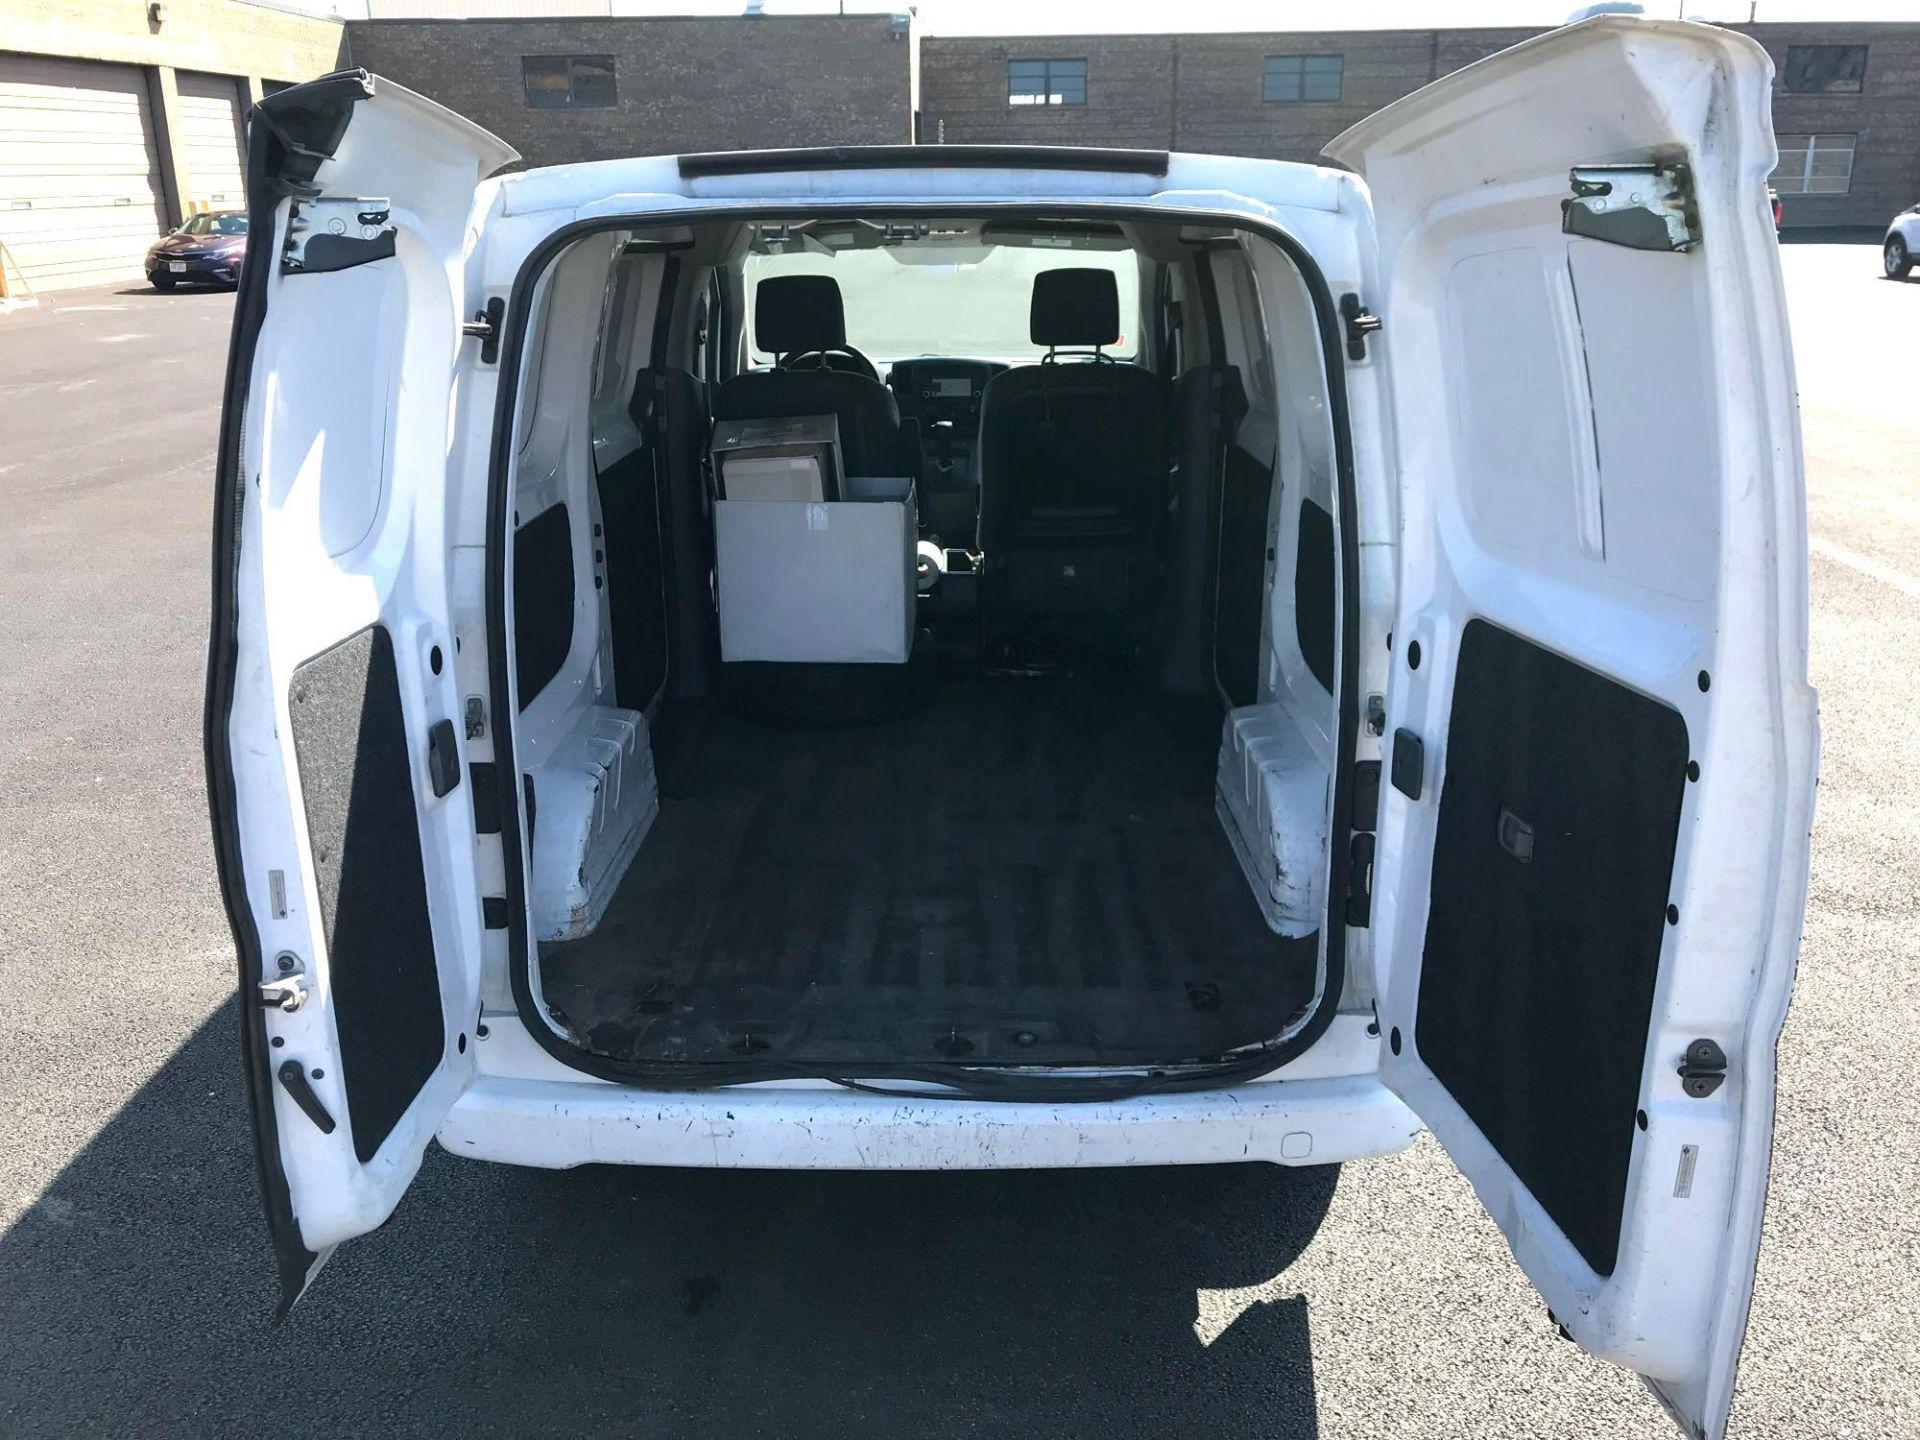 2013 Nissan NV200 Delivery Van - Image 28 of 54